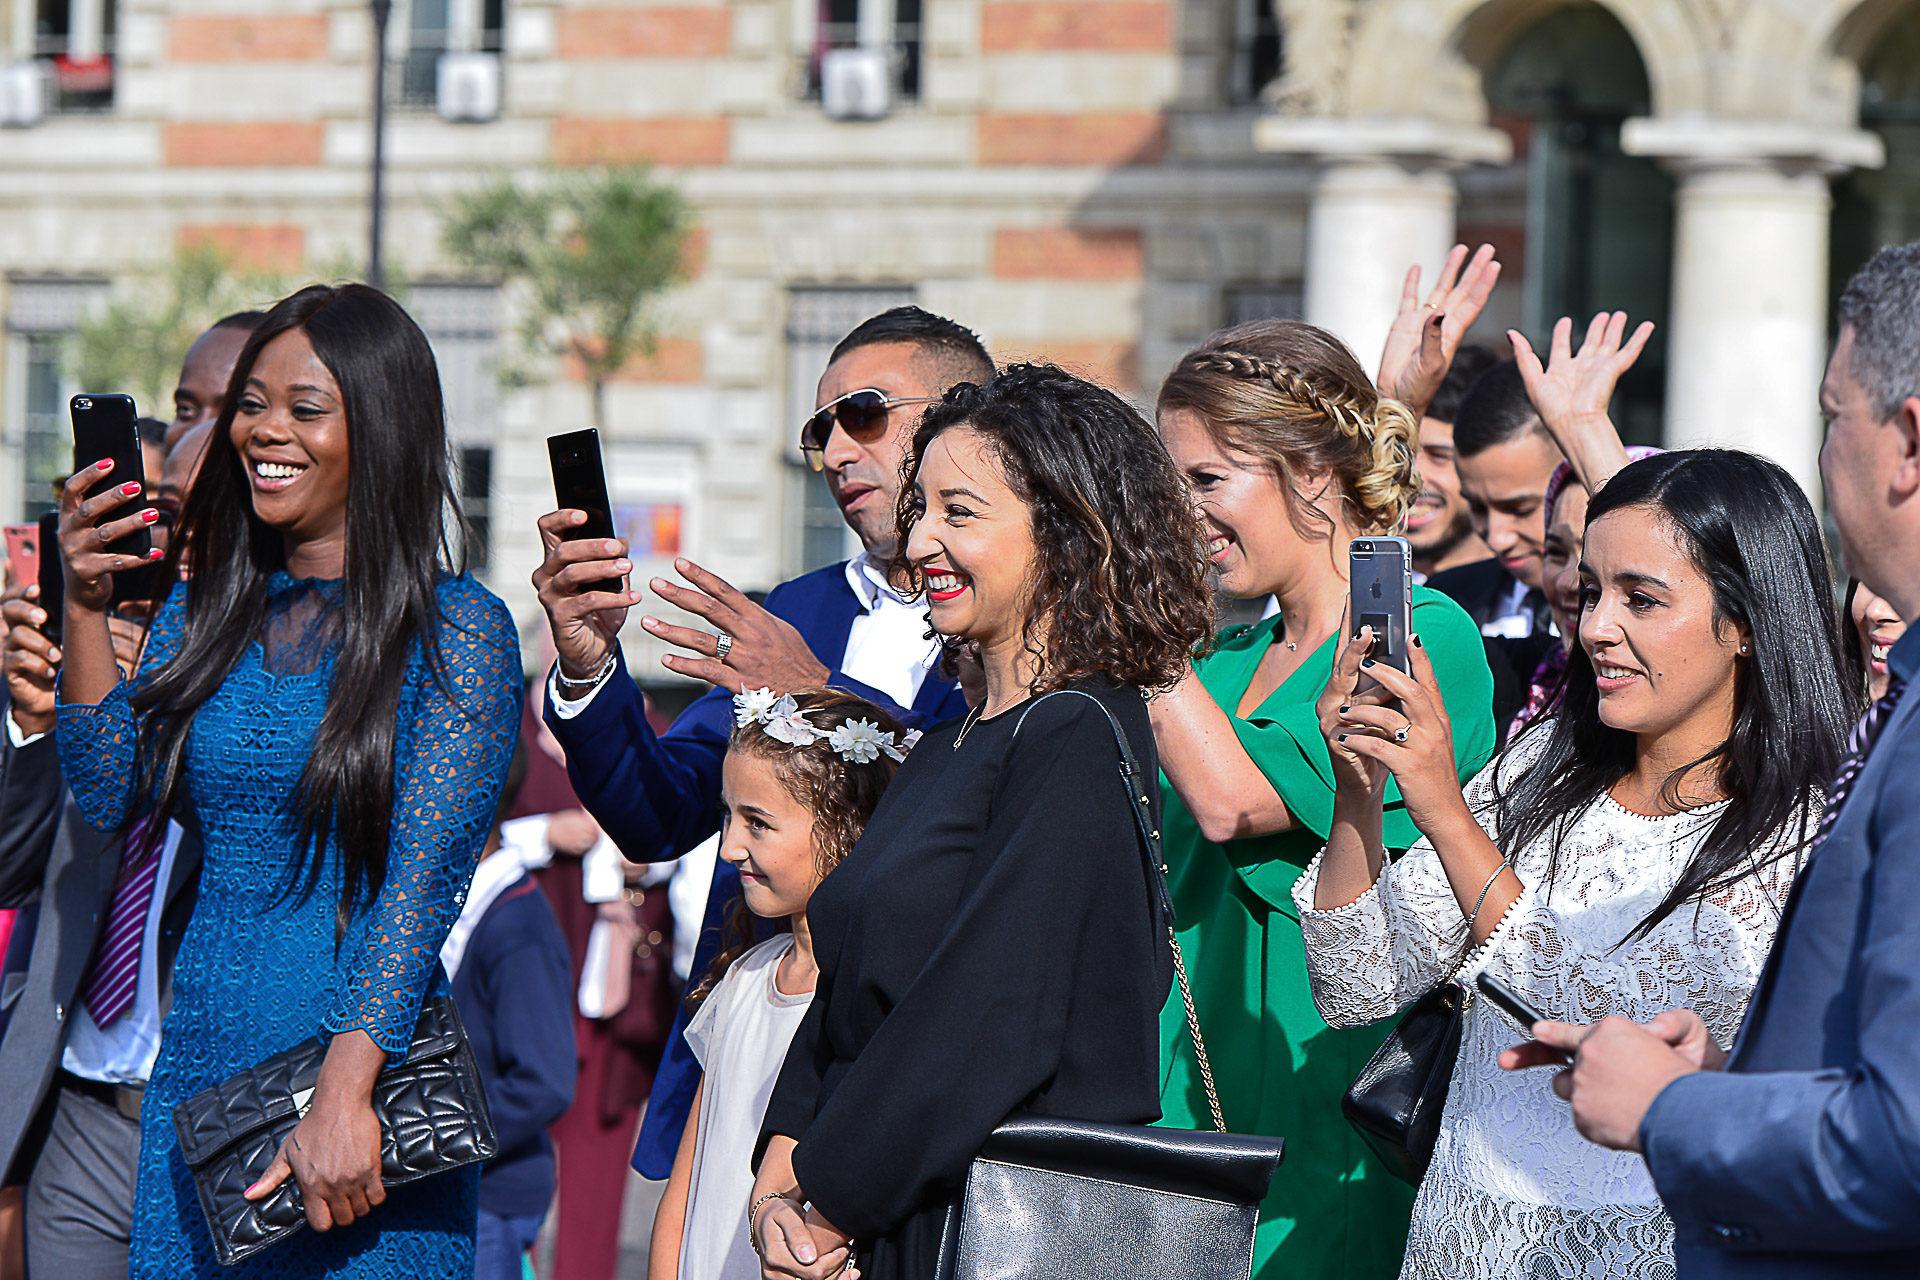 photographe-reportage-photos-mariage-paris-mairie